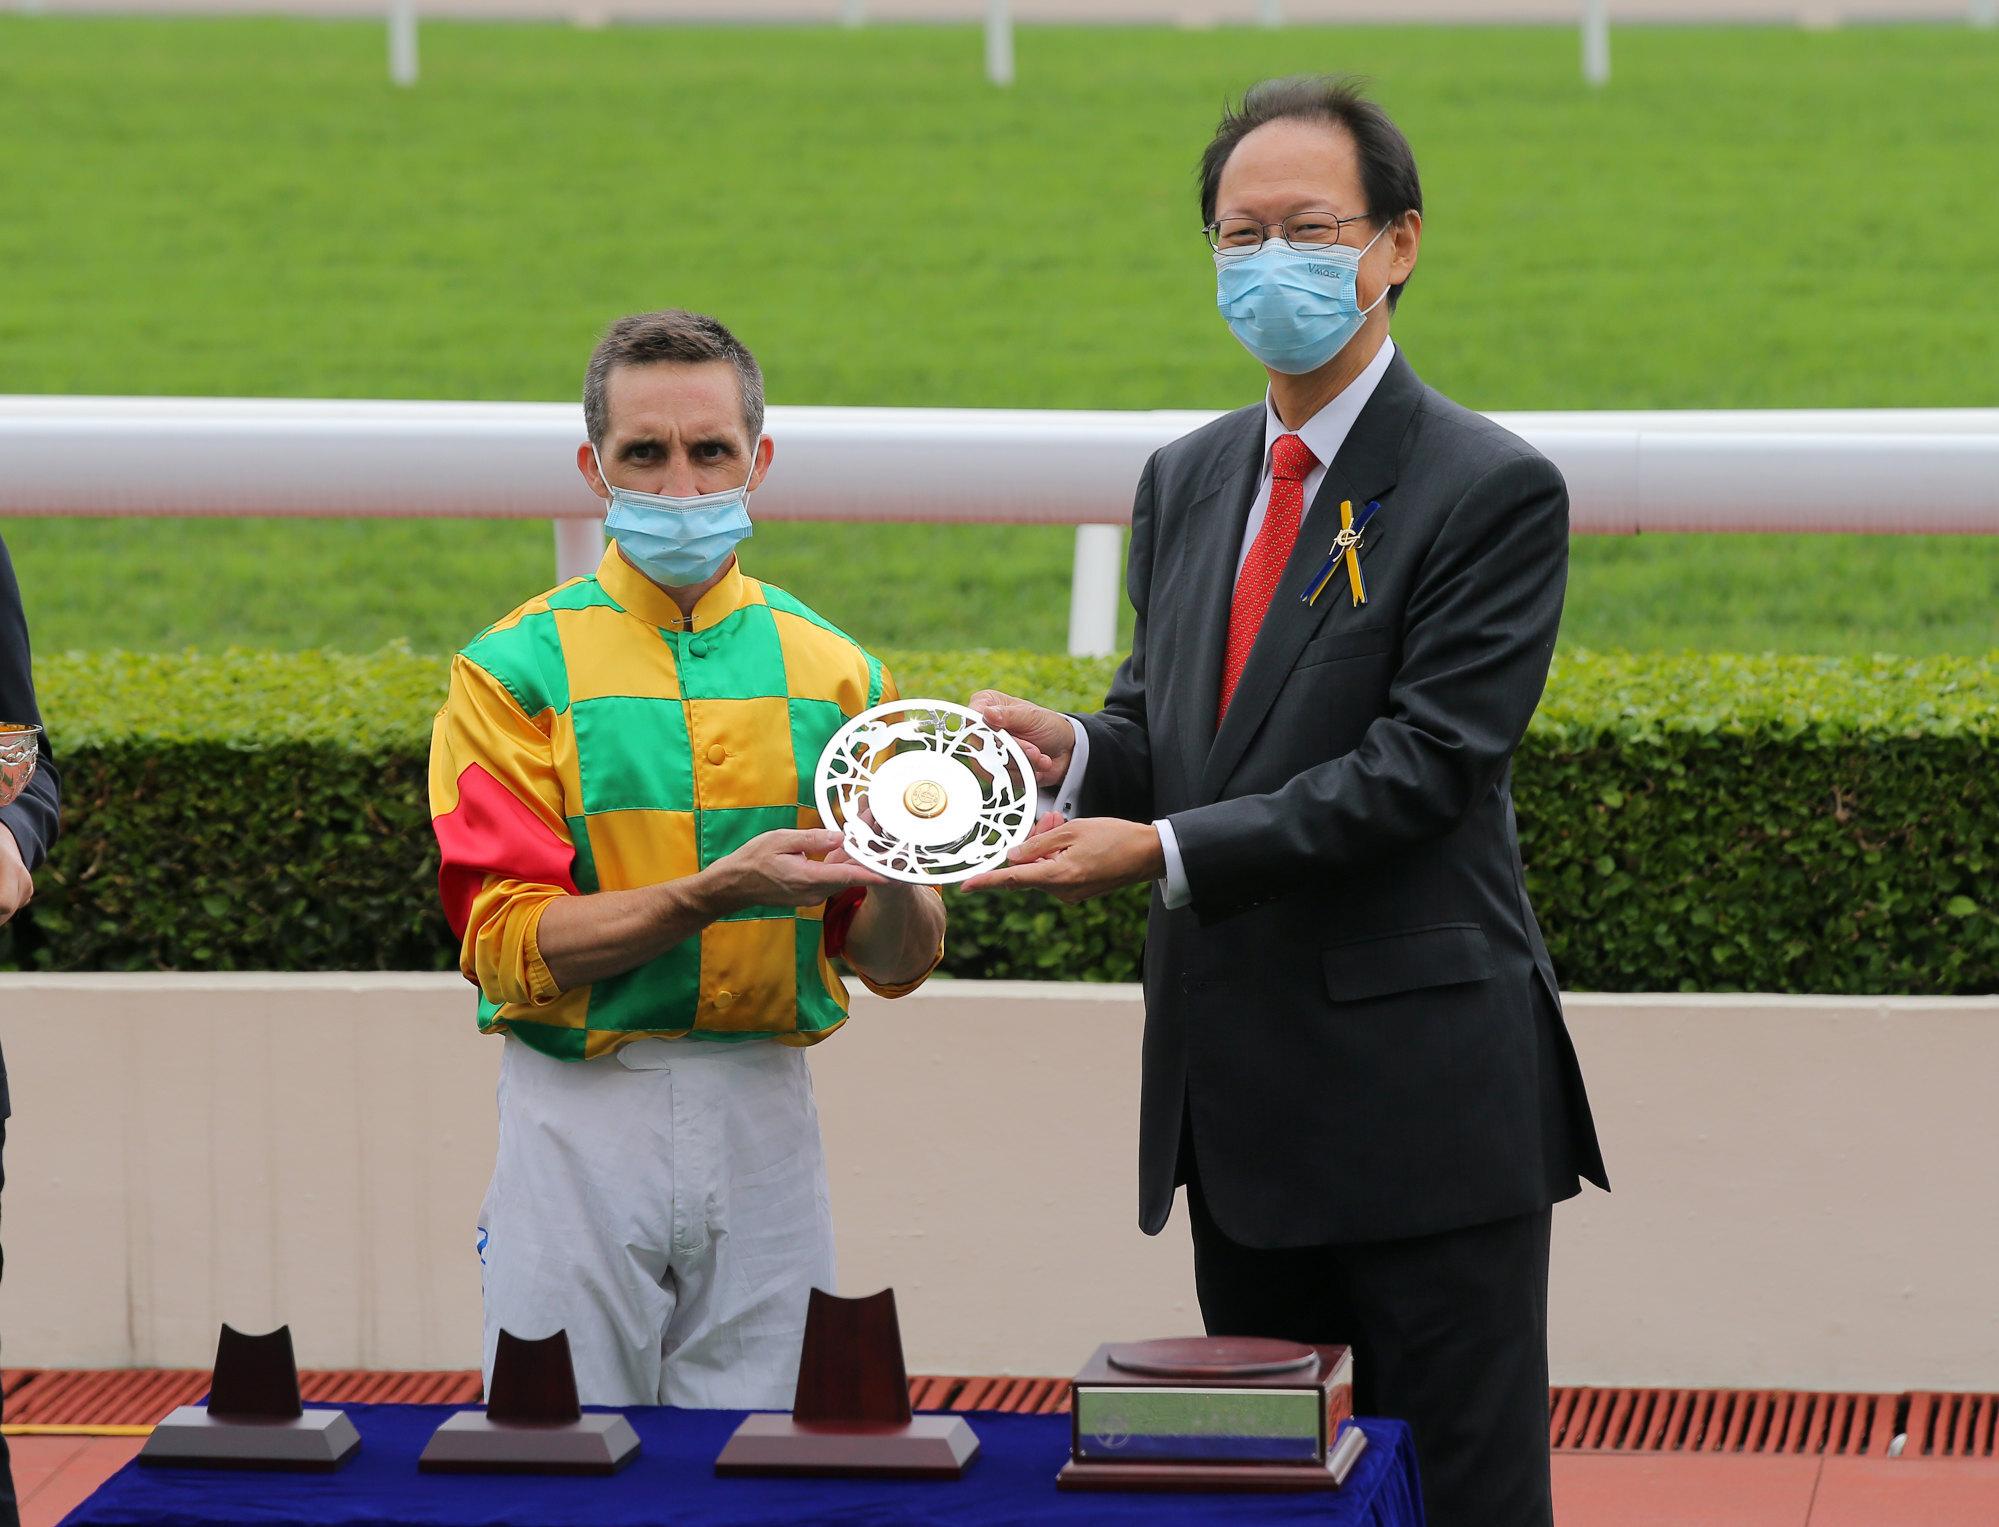 Neil Callan and Jockey Club chairman Philip Chen.